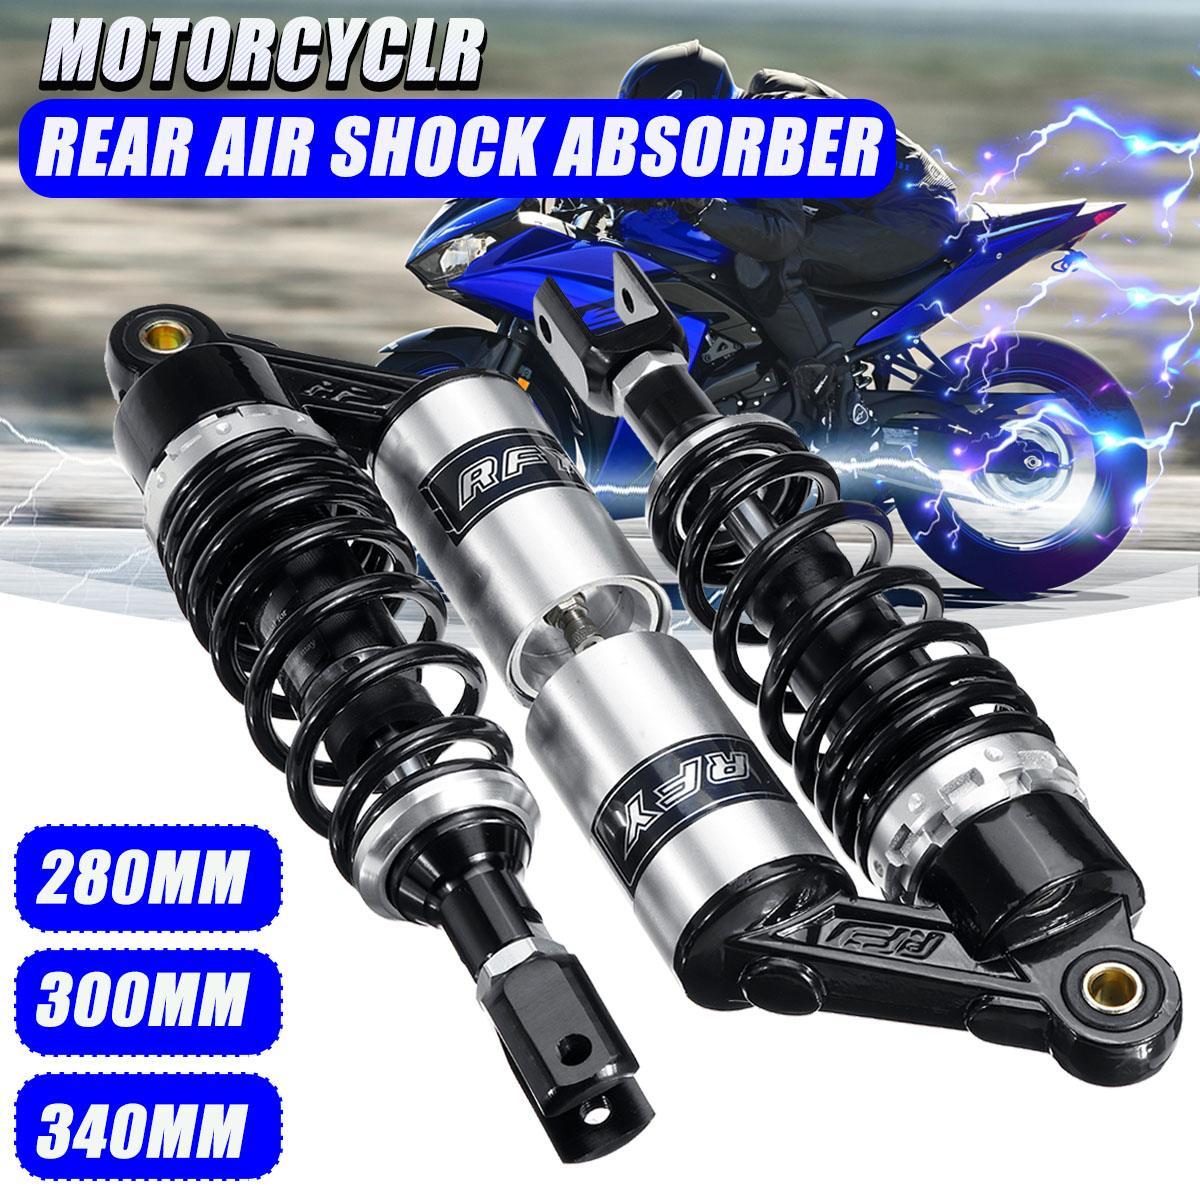 Black /& Chrome Remote Reservoir Motorcycle Shocks Eye To Eye 340mm 350mm